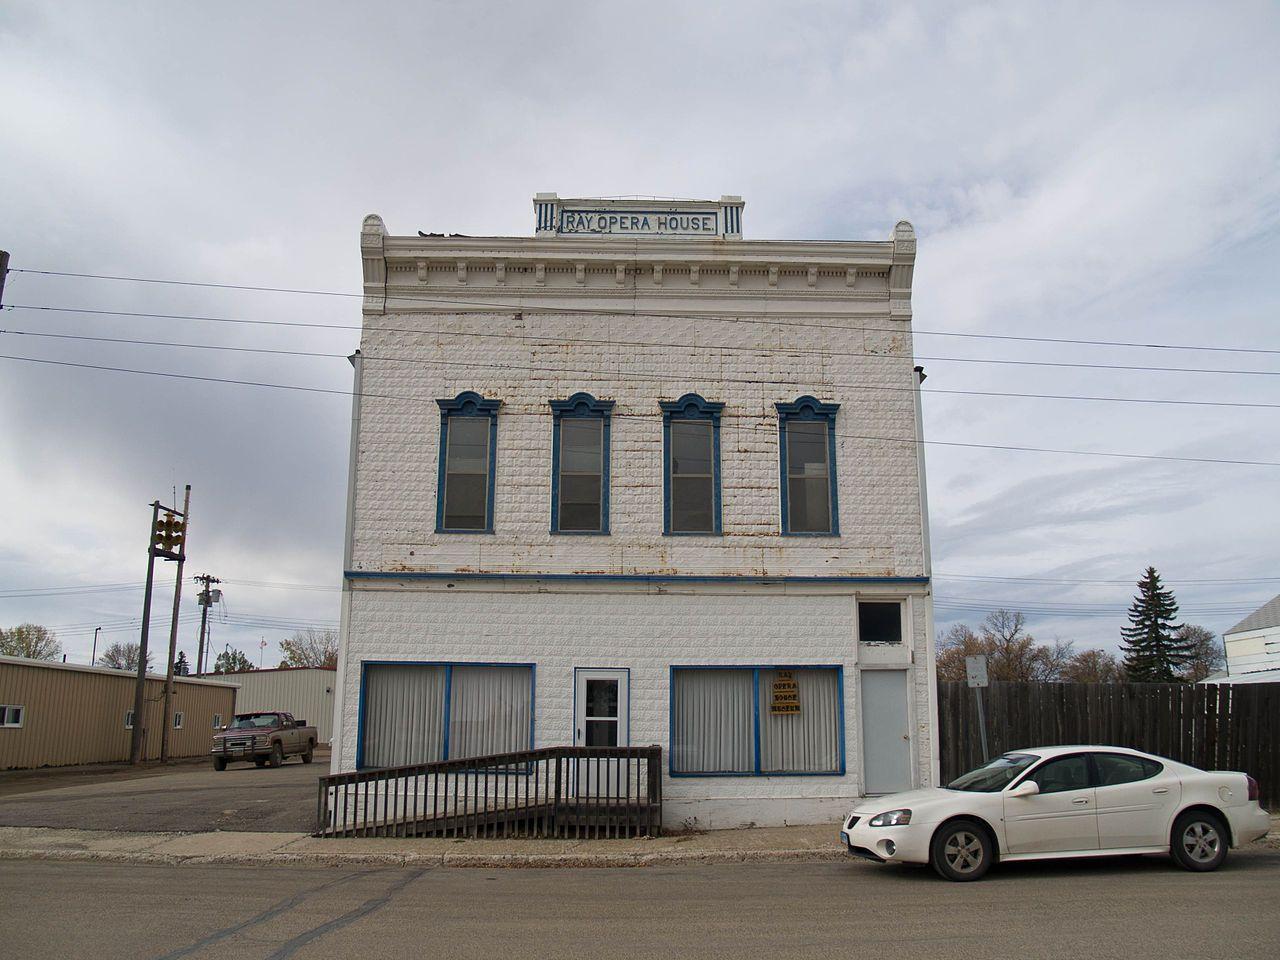 Ray Opera House in Williams County, North Dakota.